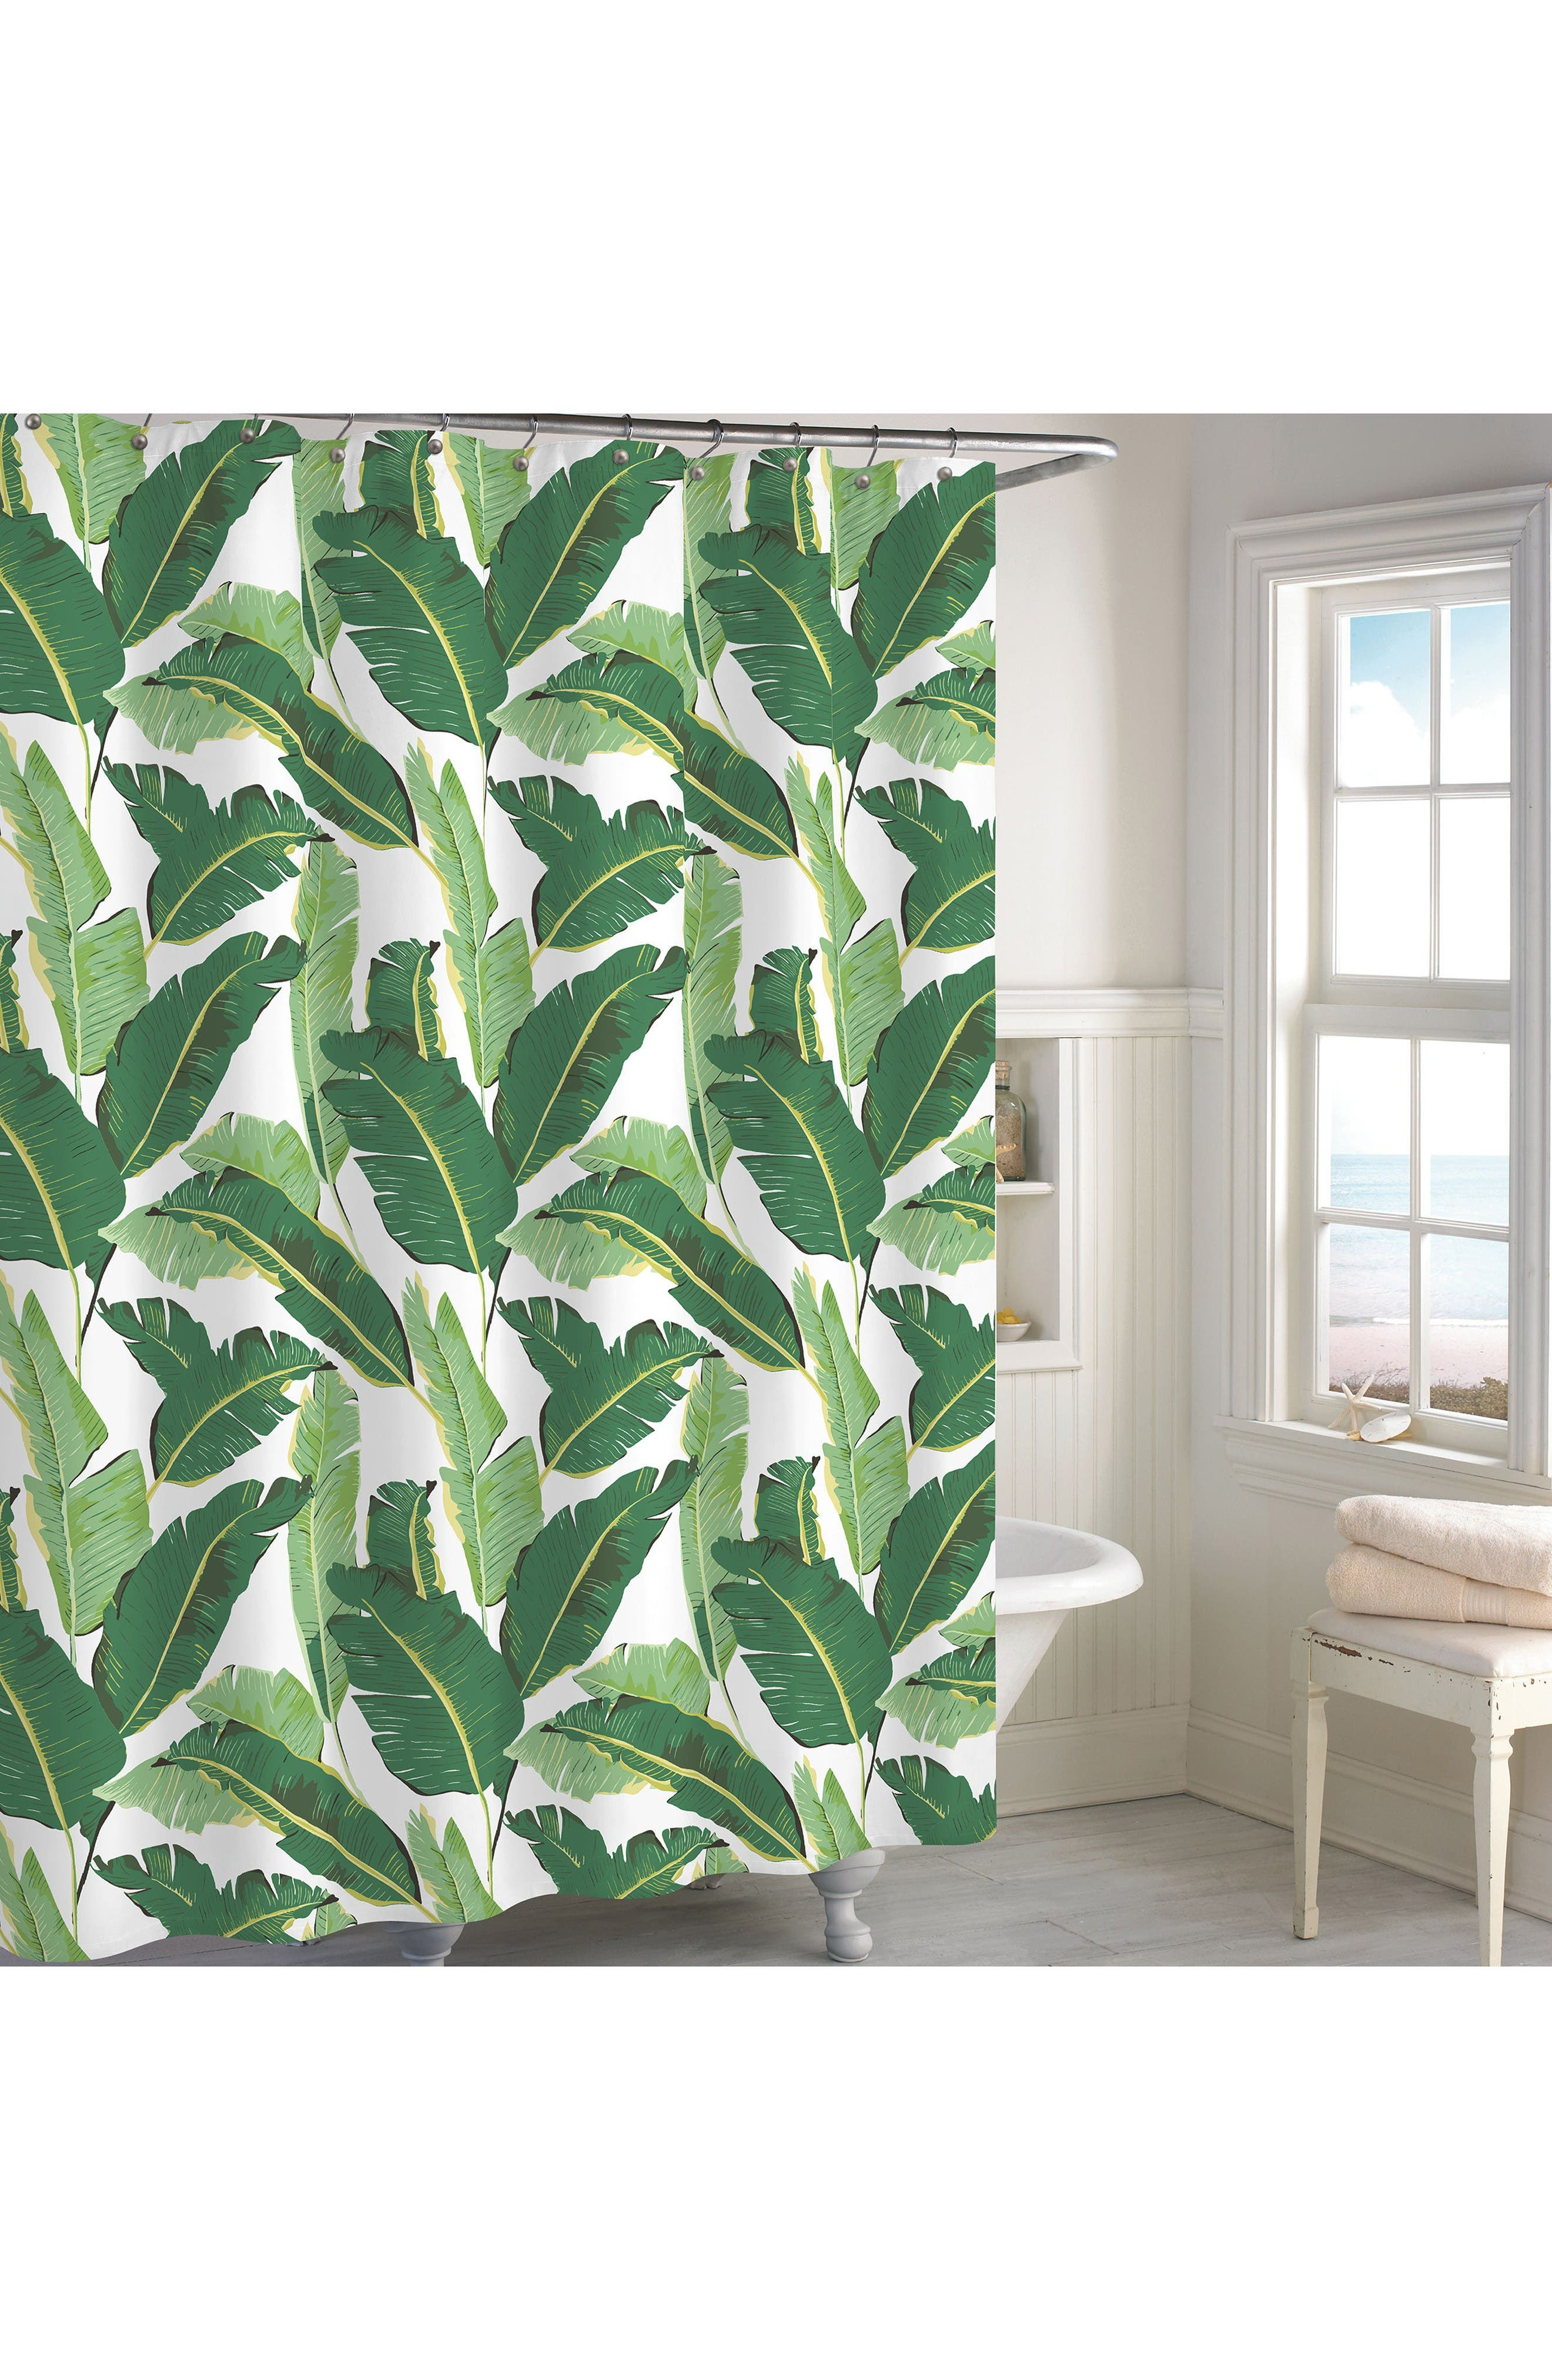 Miami Leaf Shower Curtain,                             Main thumbnail 1, color,                             Green